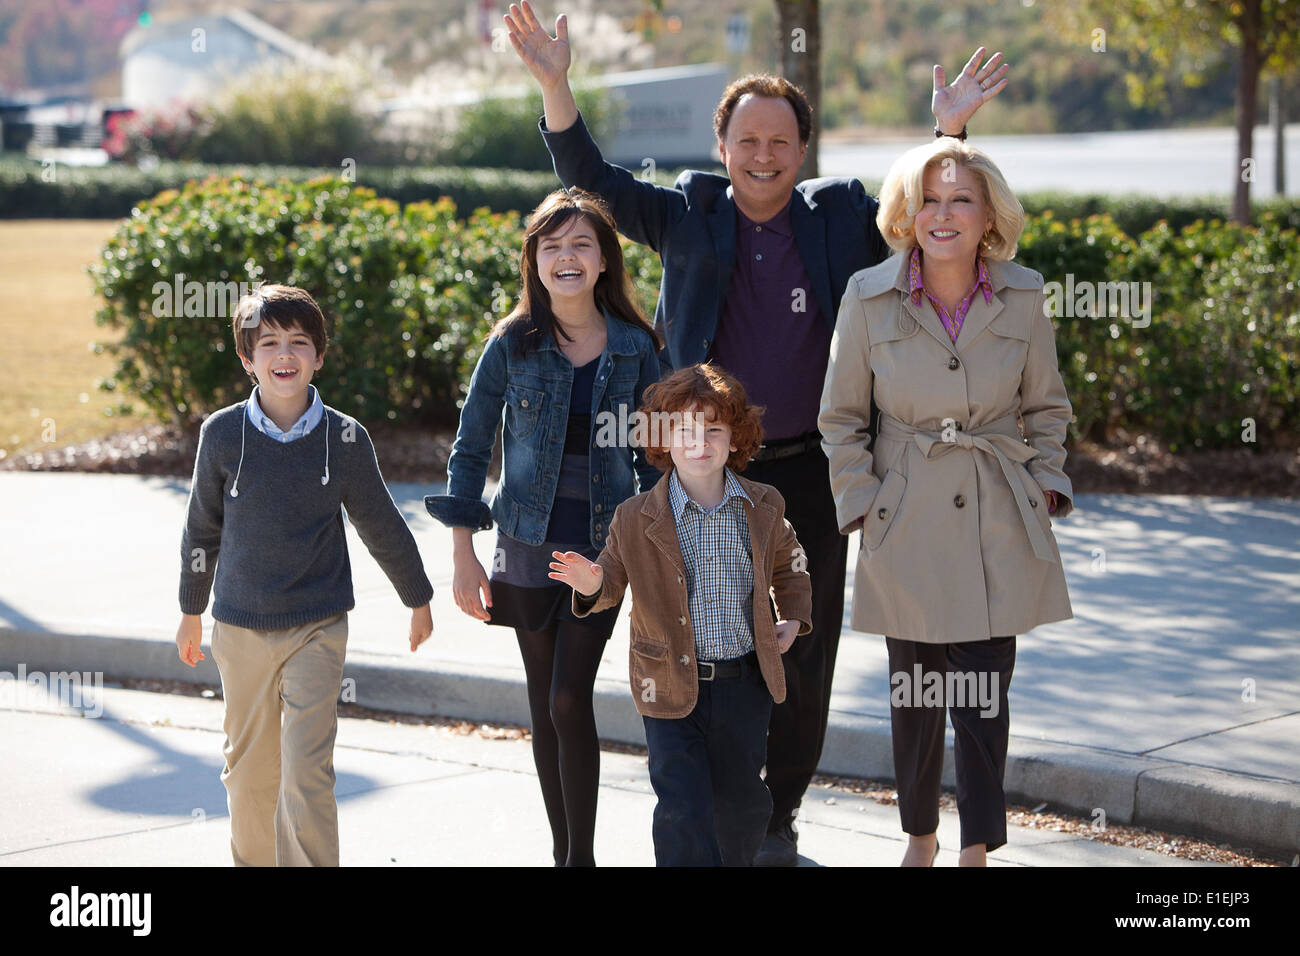 PARENTAL GUIDANCE (2012) JOSHUA RUSH BAILEE MADISON KYLE HARRISON BILLY CRYSTAL BETTE MIDLER ANDY FICKMAN (DIR) MOVIESTORE - Stock Image